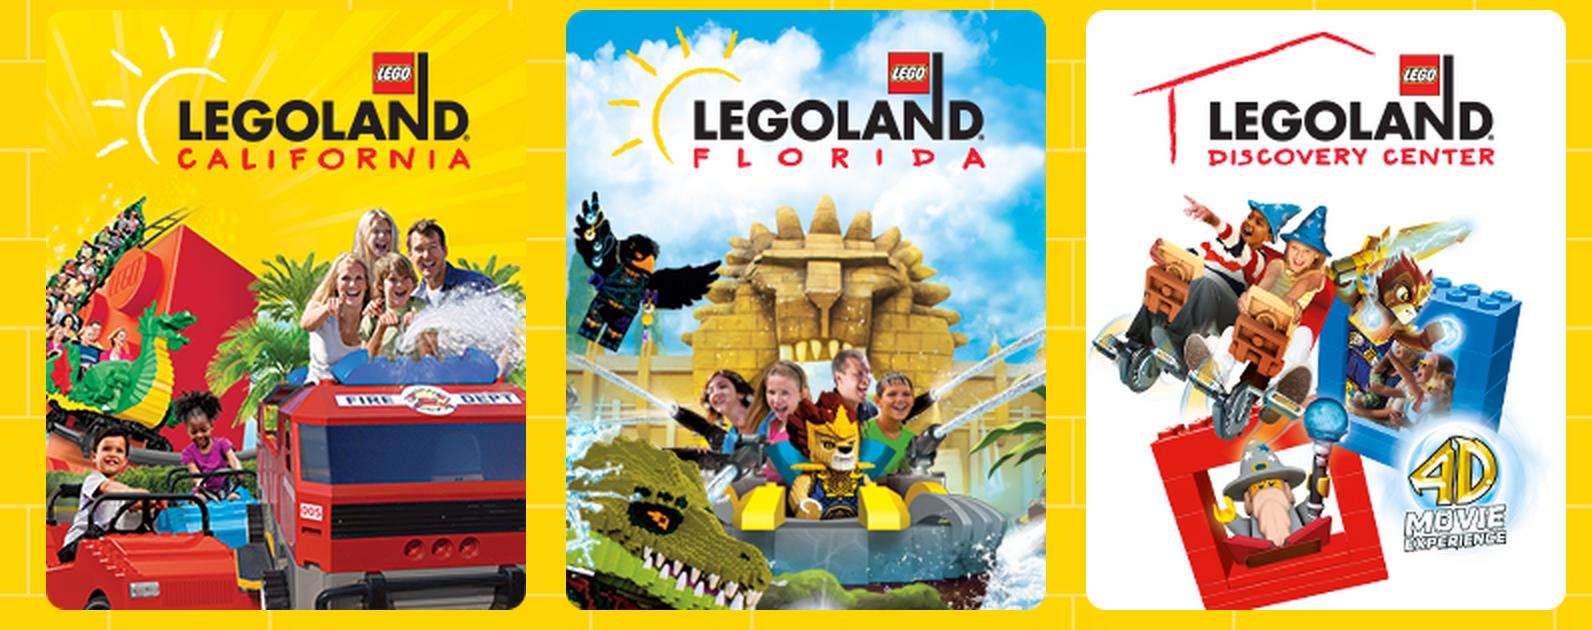 Legoland Coupon Legoland Orlando Park Coupon Legoland California Park Coupon Buy One Get One Free Legoland Coupon Legoland Coupons Legoland Legoland California Legoland Florida